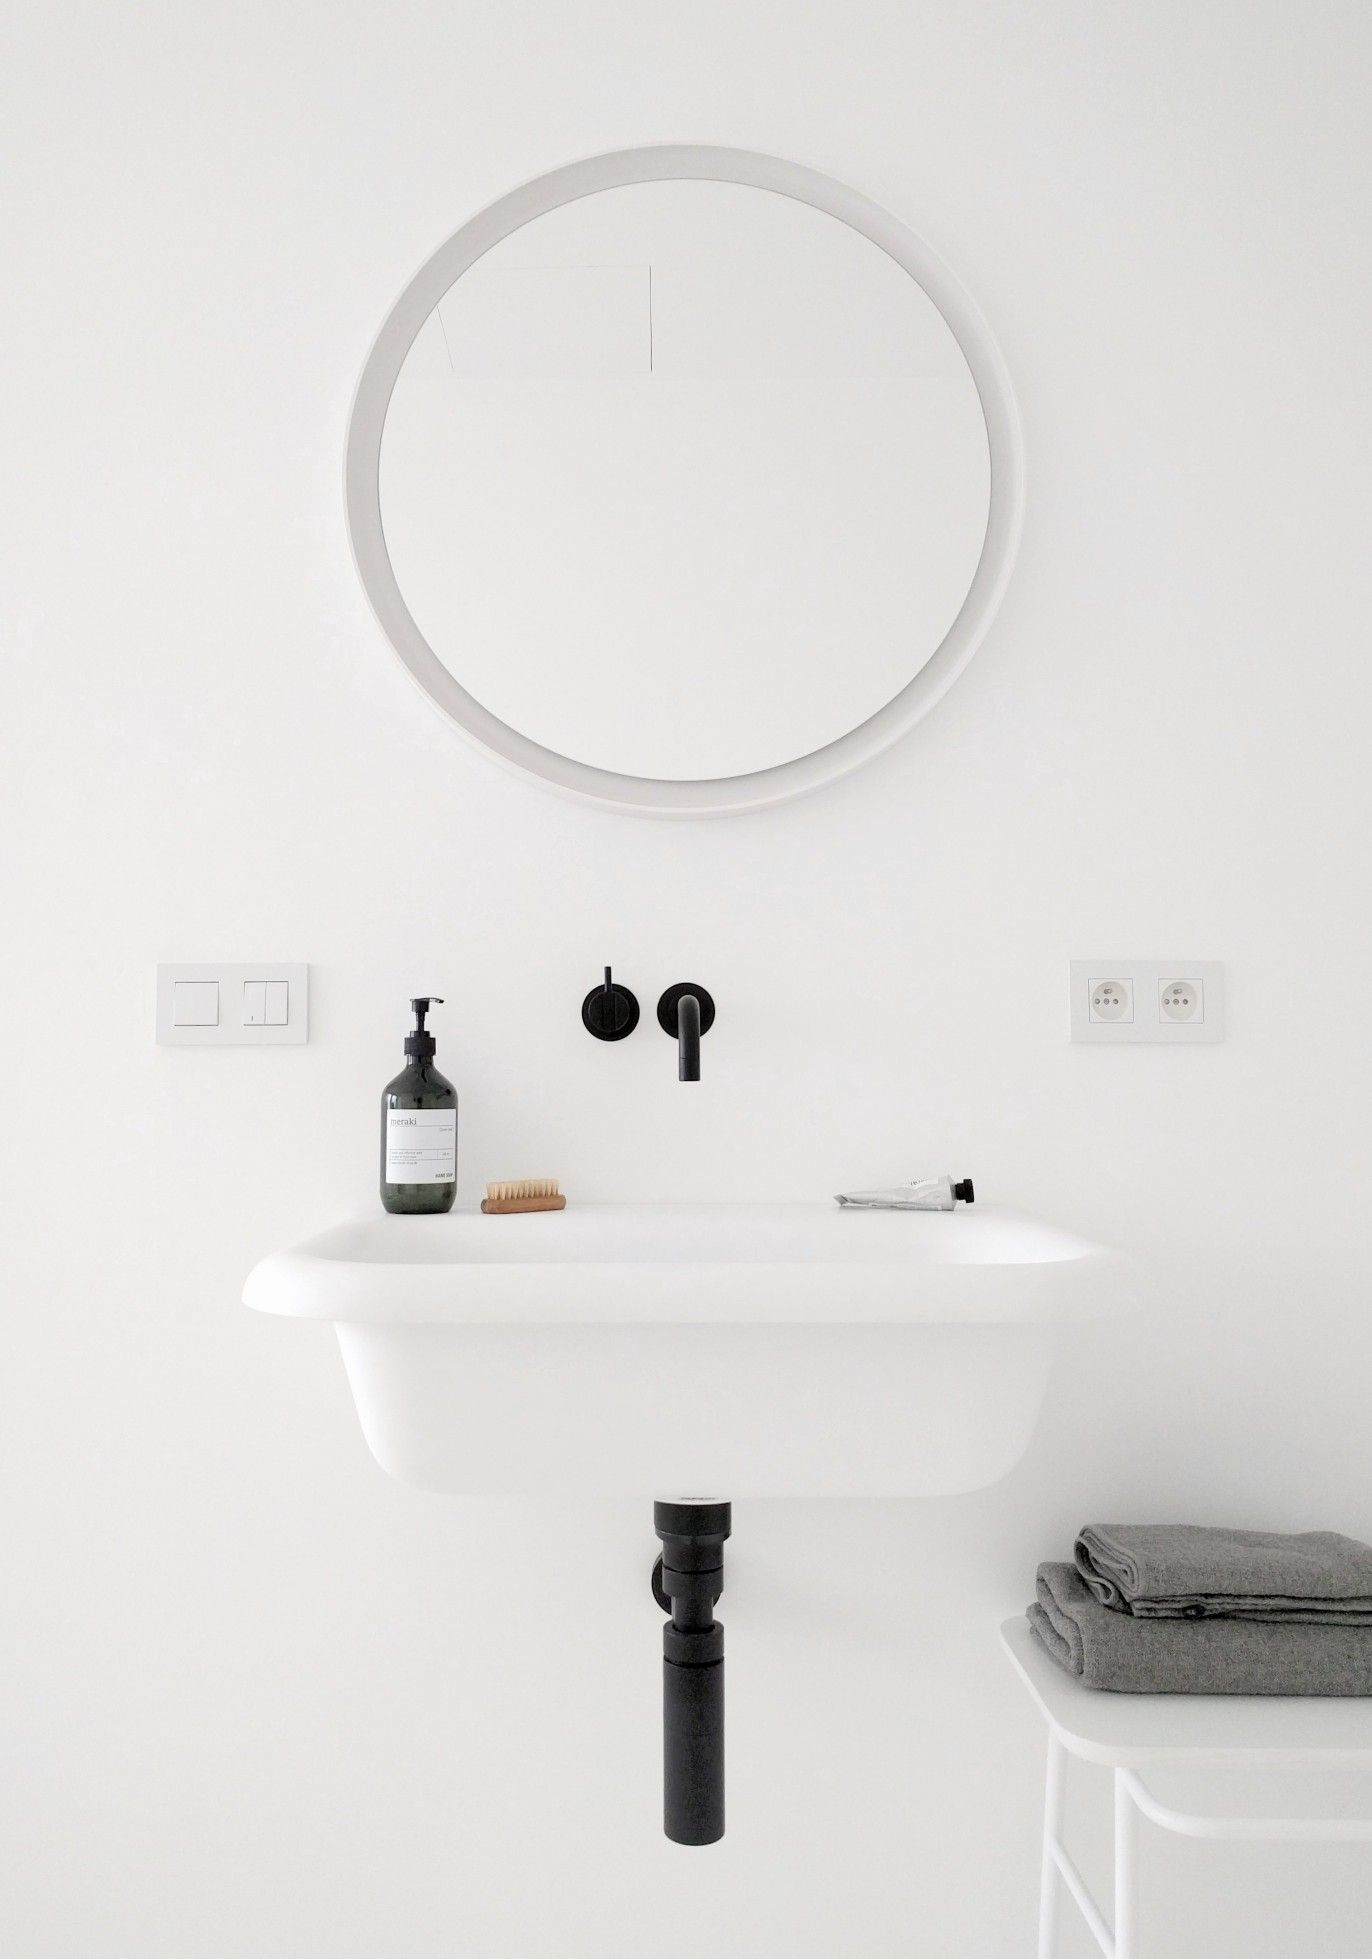 Espejo de pared Hub 91cm | Black white bathrooms, Faucet and Stools